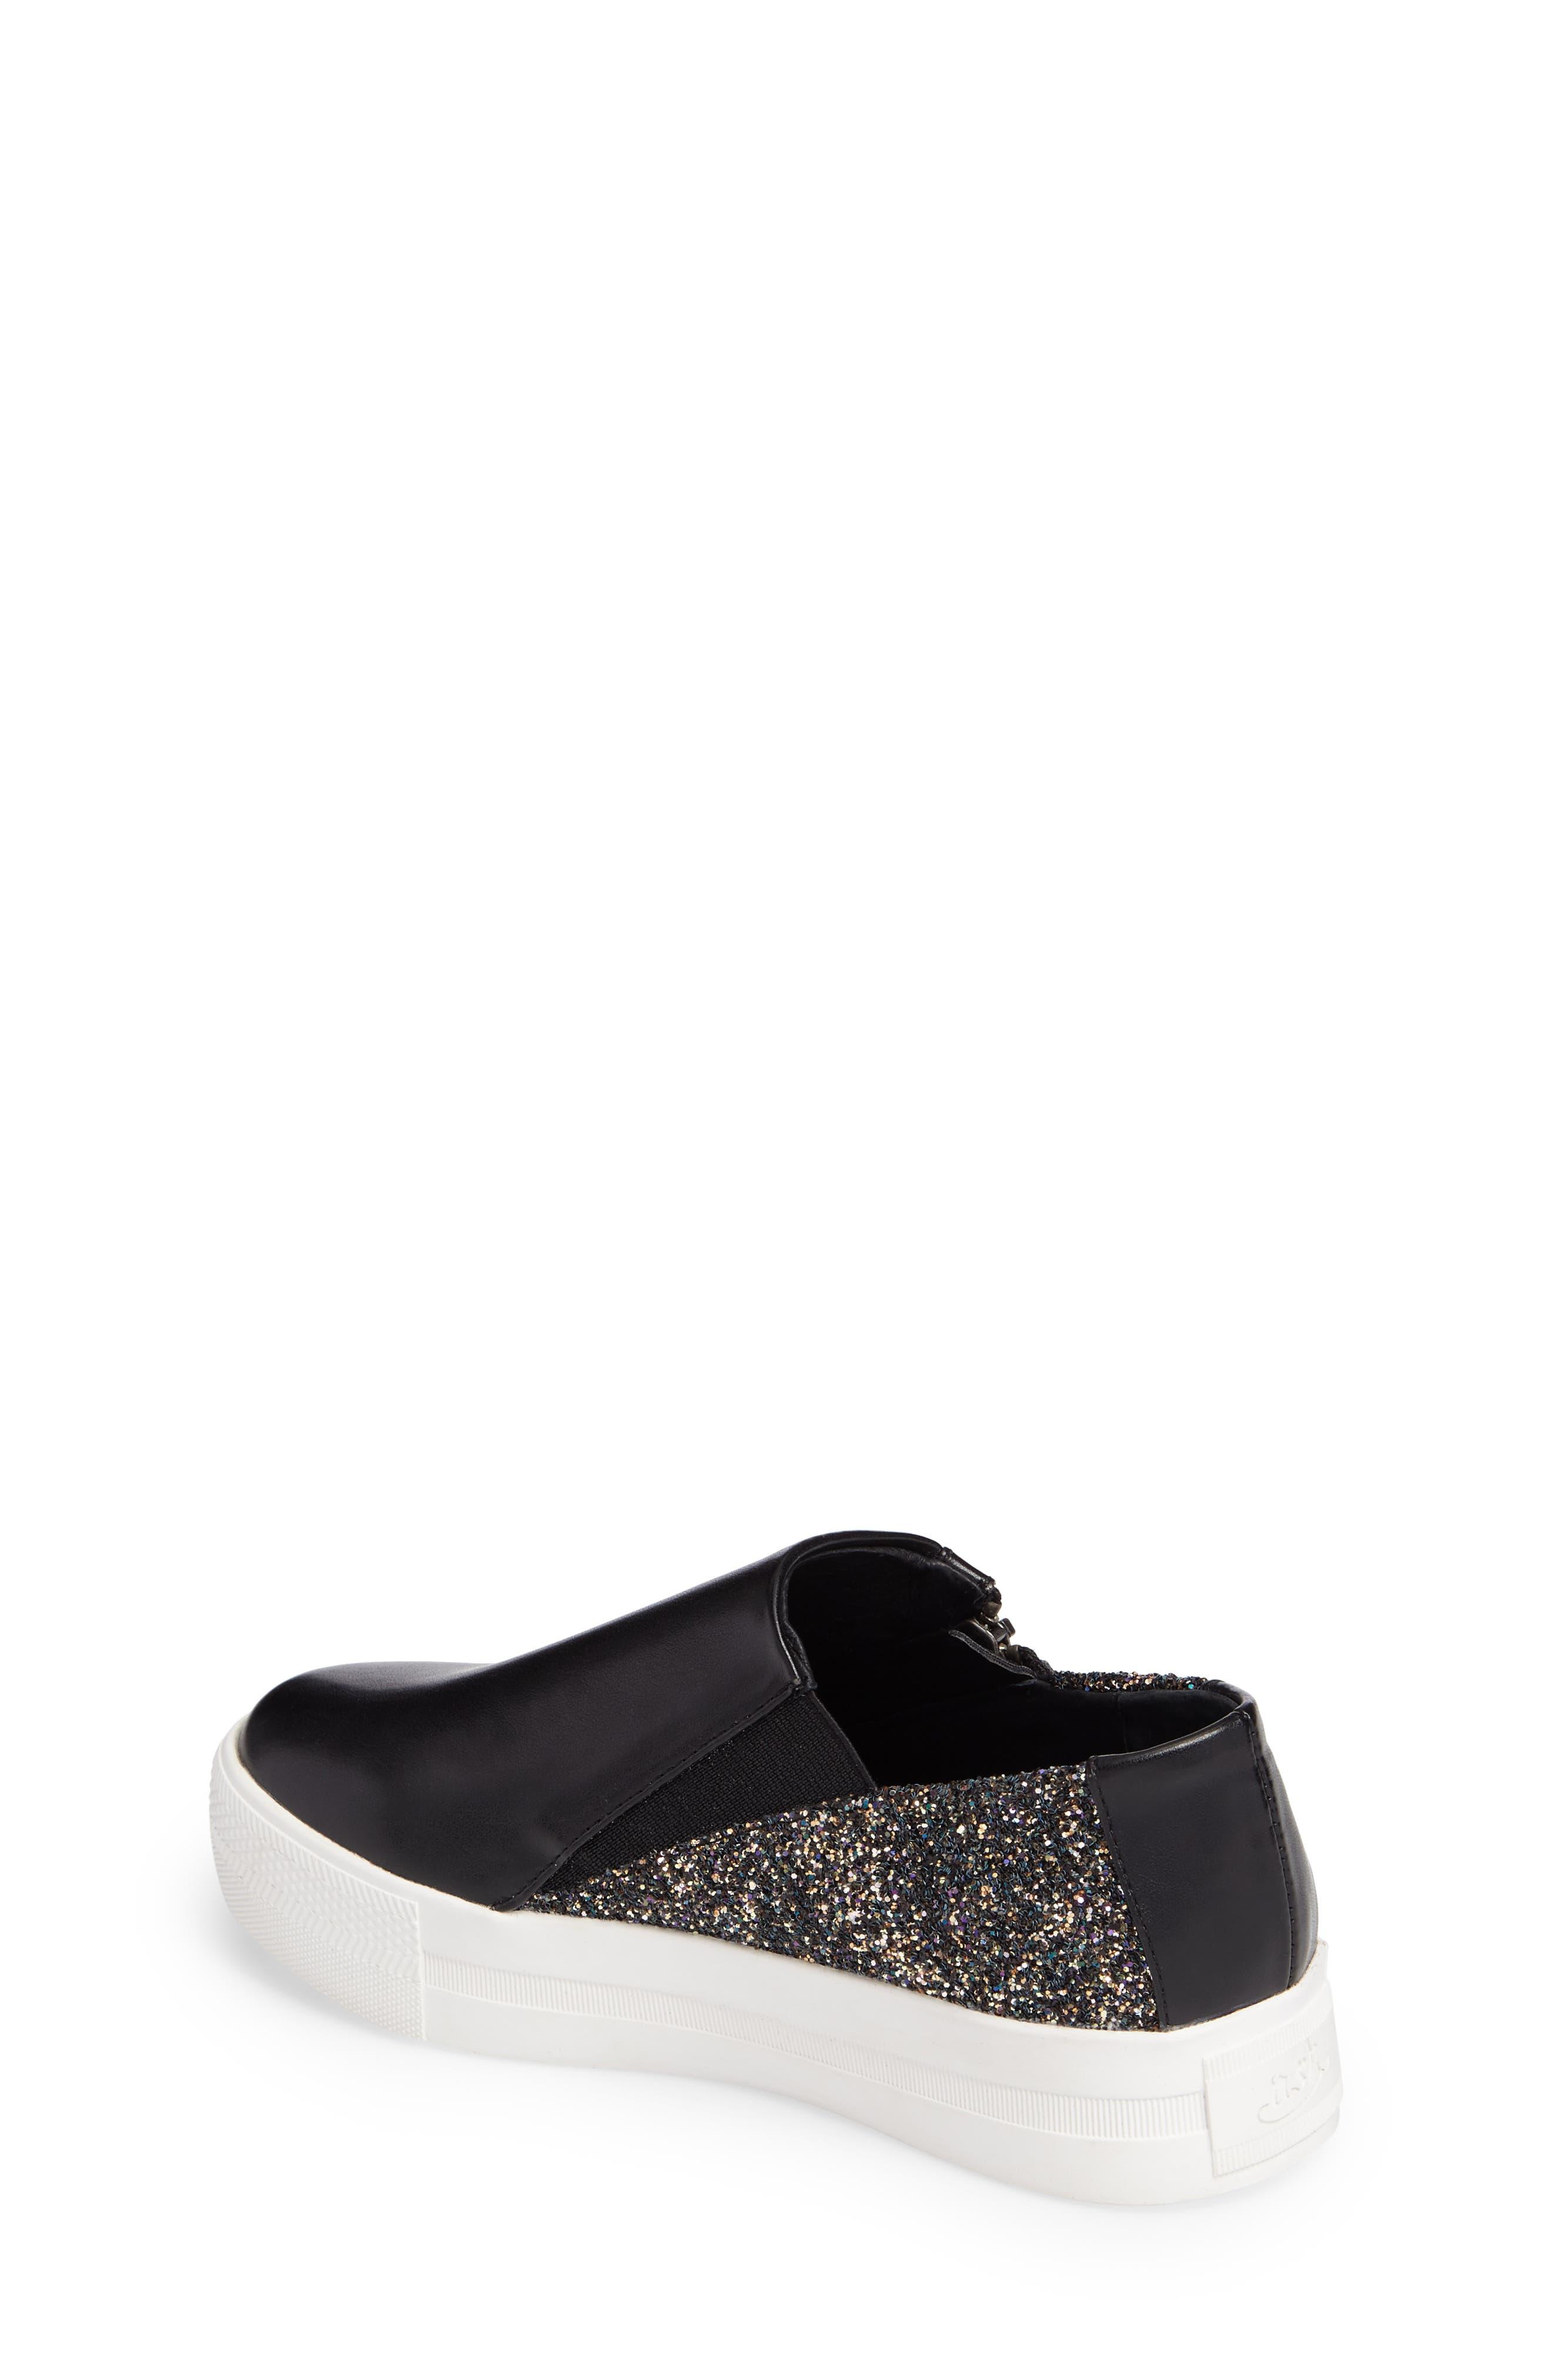 Lynn Monica Glittery Zip Sneaker,                             Alternate thumbnail 2, color,                             Black Faux Leather